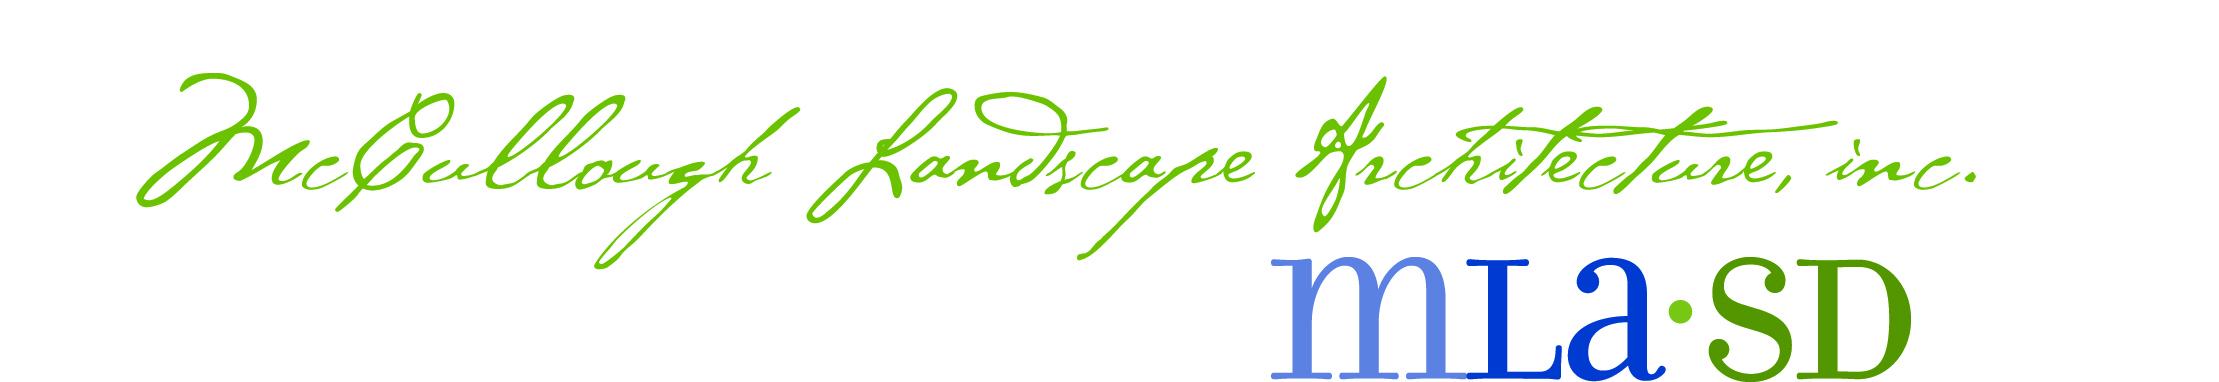 McCullough_Logo.jpg